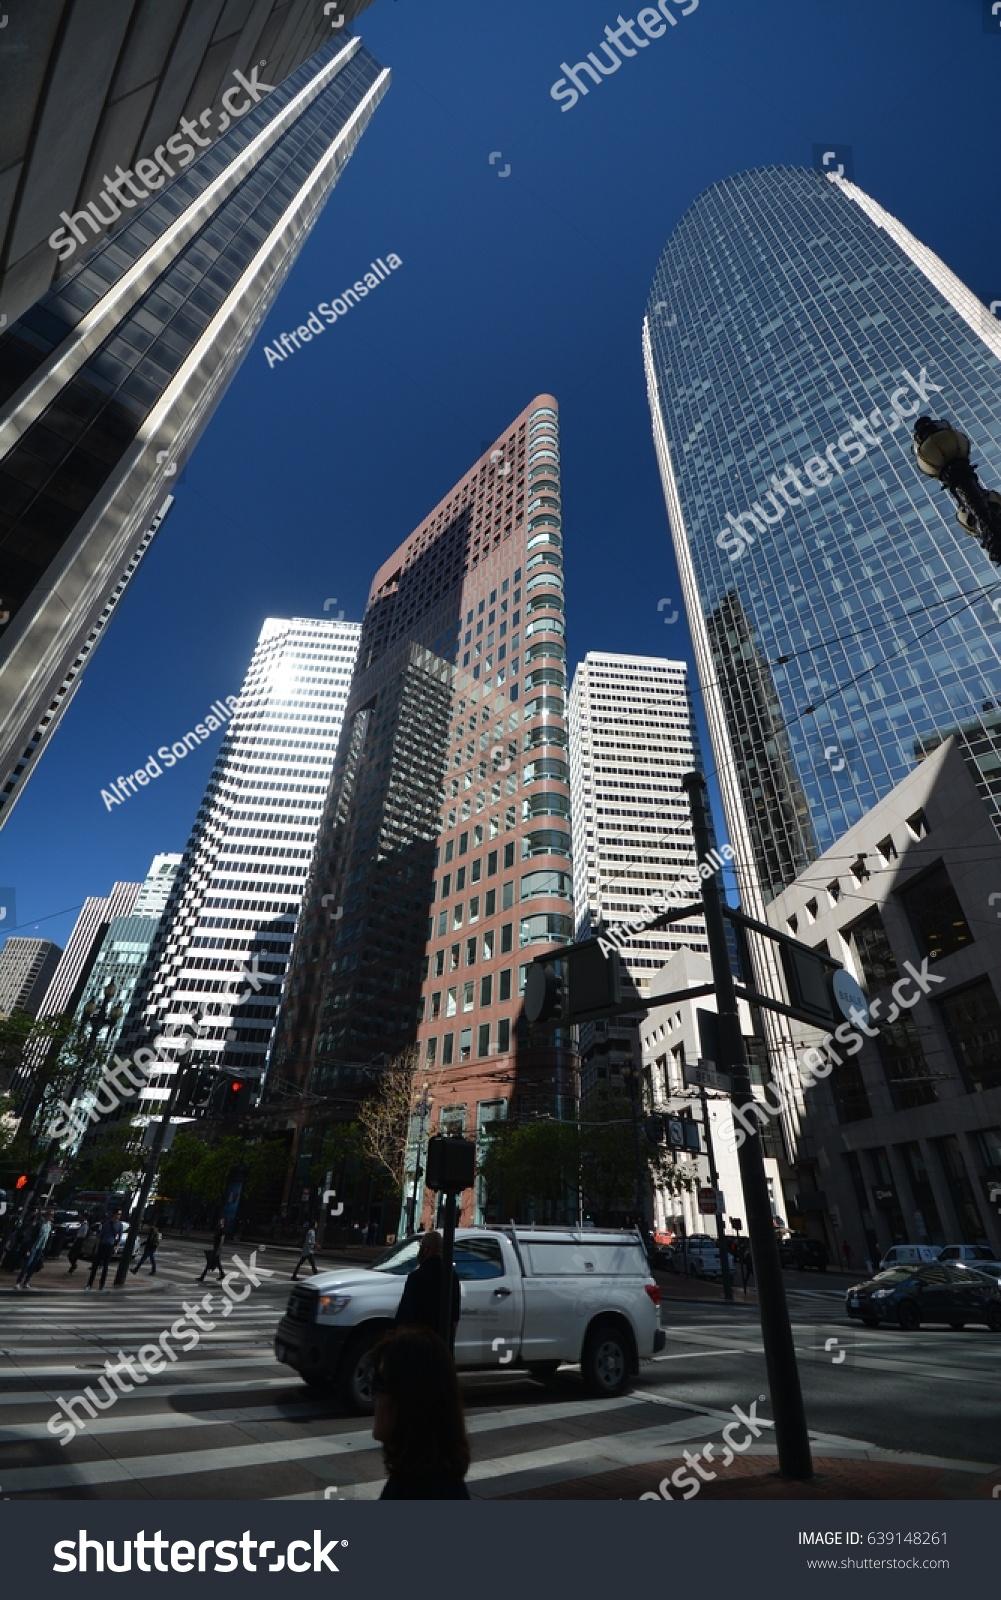 City Center Of San Francisco From May 1 2017 California Usa